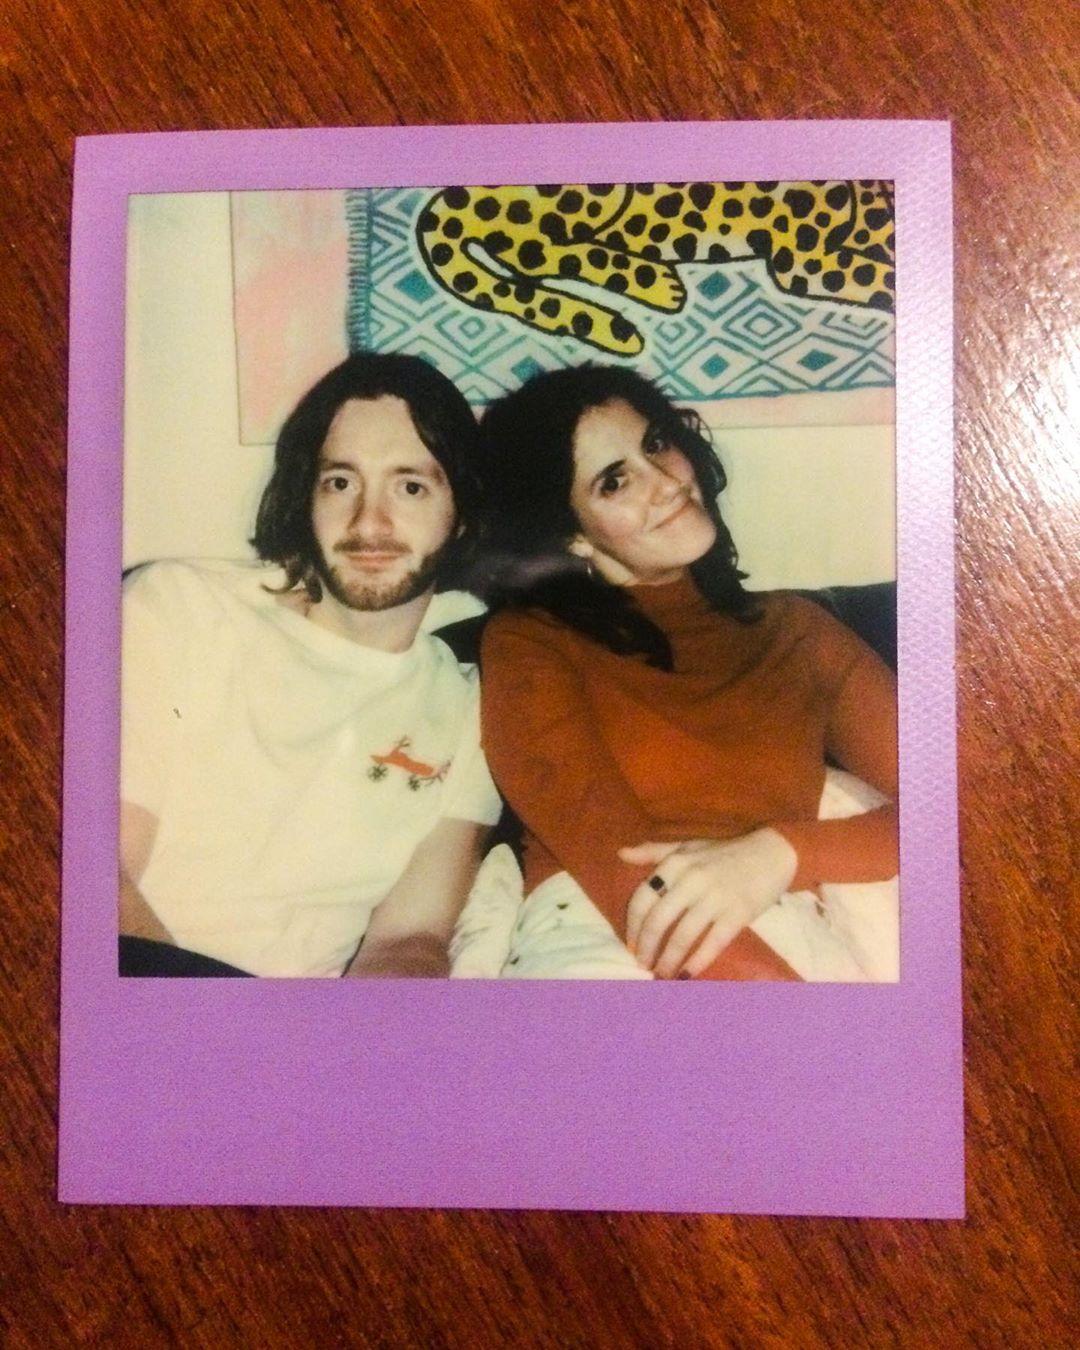 gramrcy-shanti-polaroid-peach-discs-everpress-blog